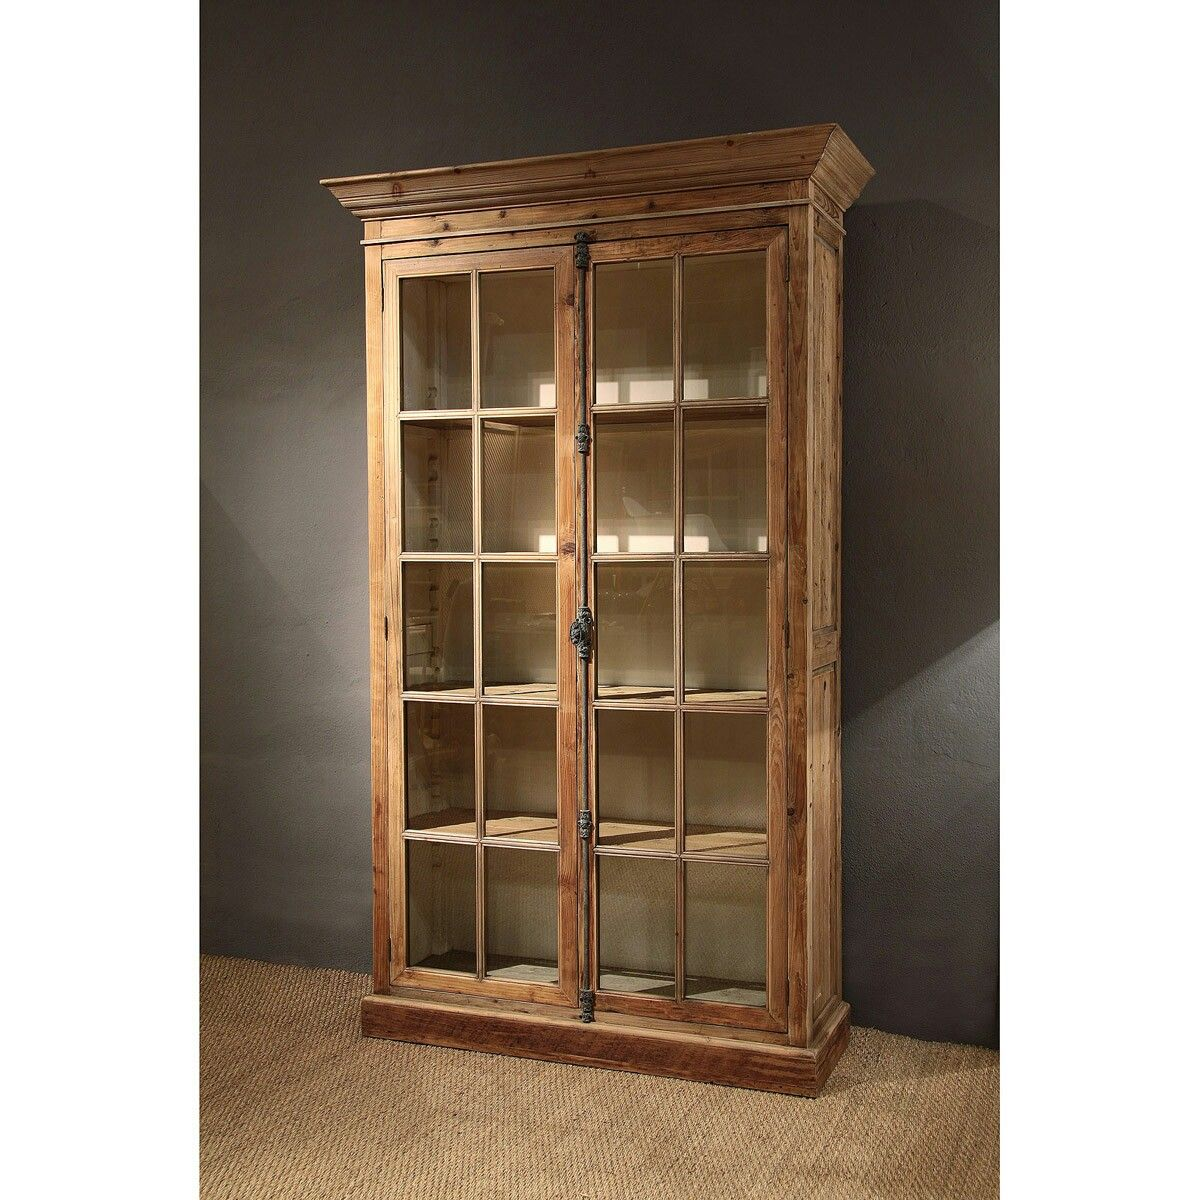 Vitrina con pasador madera natural reciclada muebles al natural furniture kitchen armoire y - Muebles al natural ...